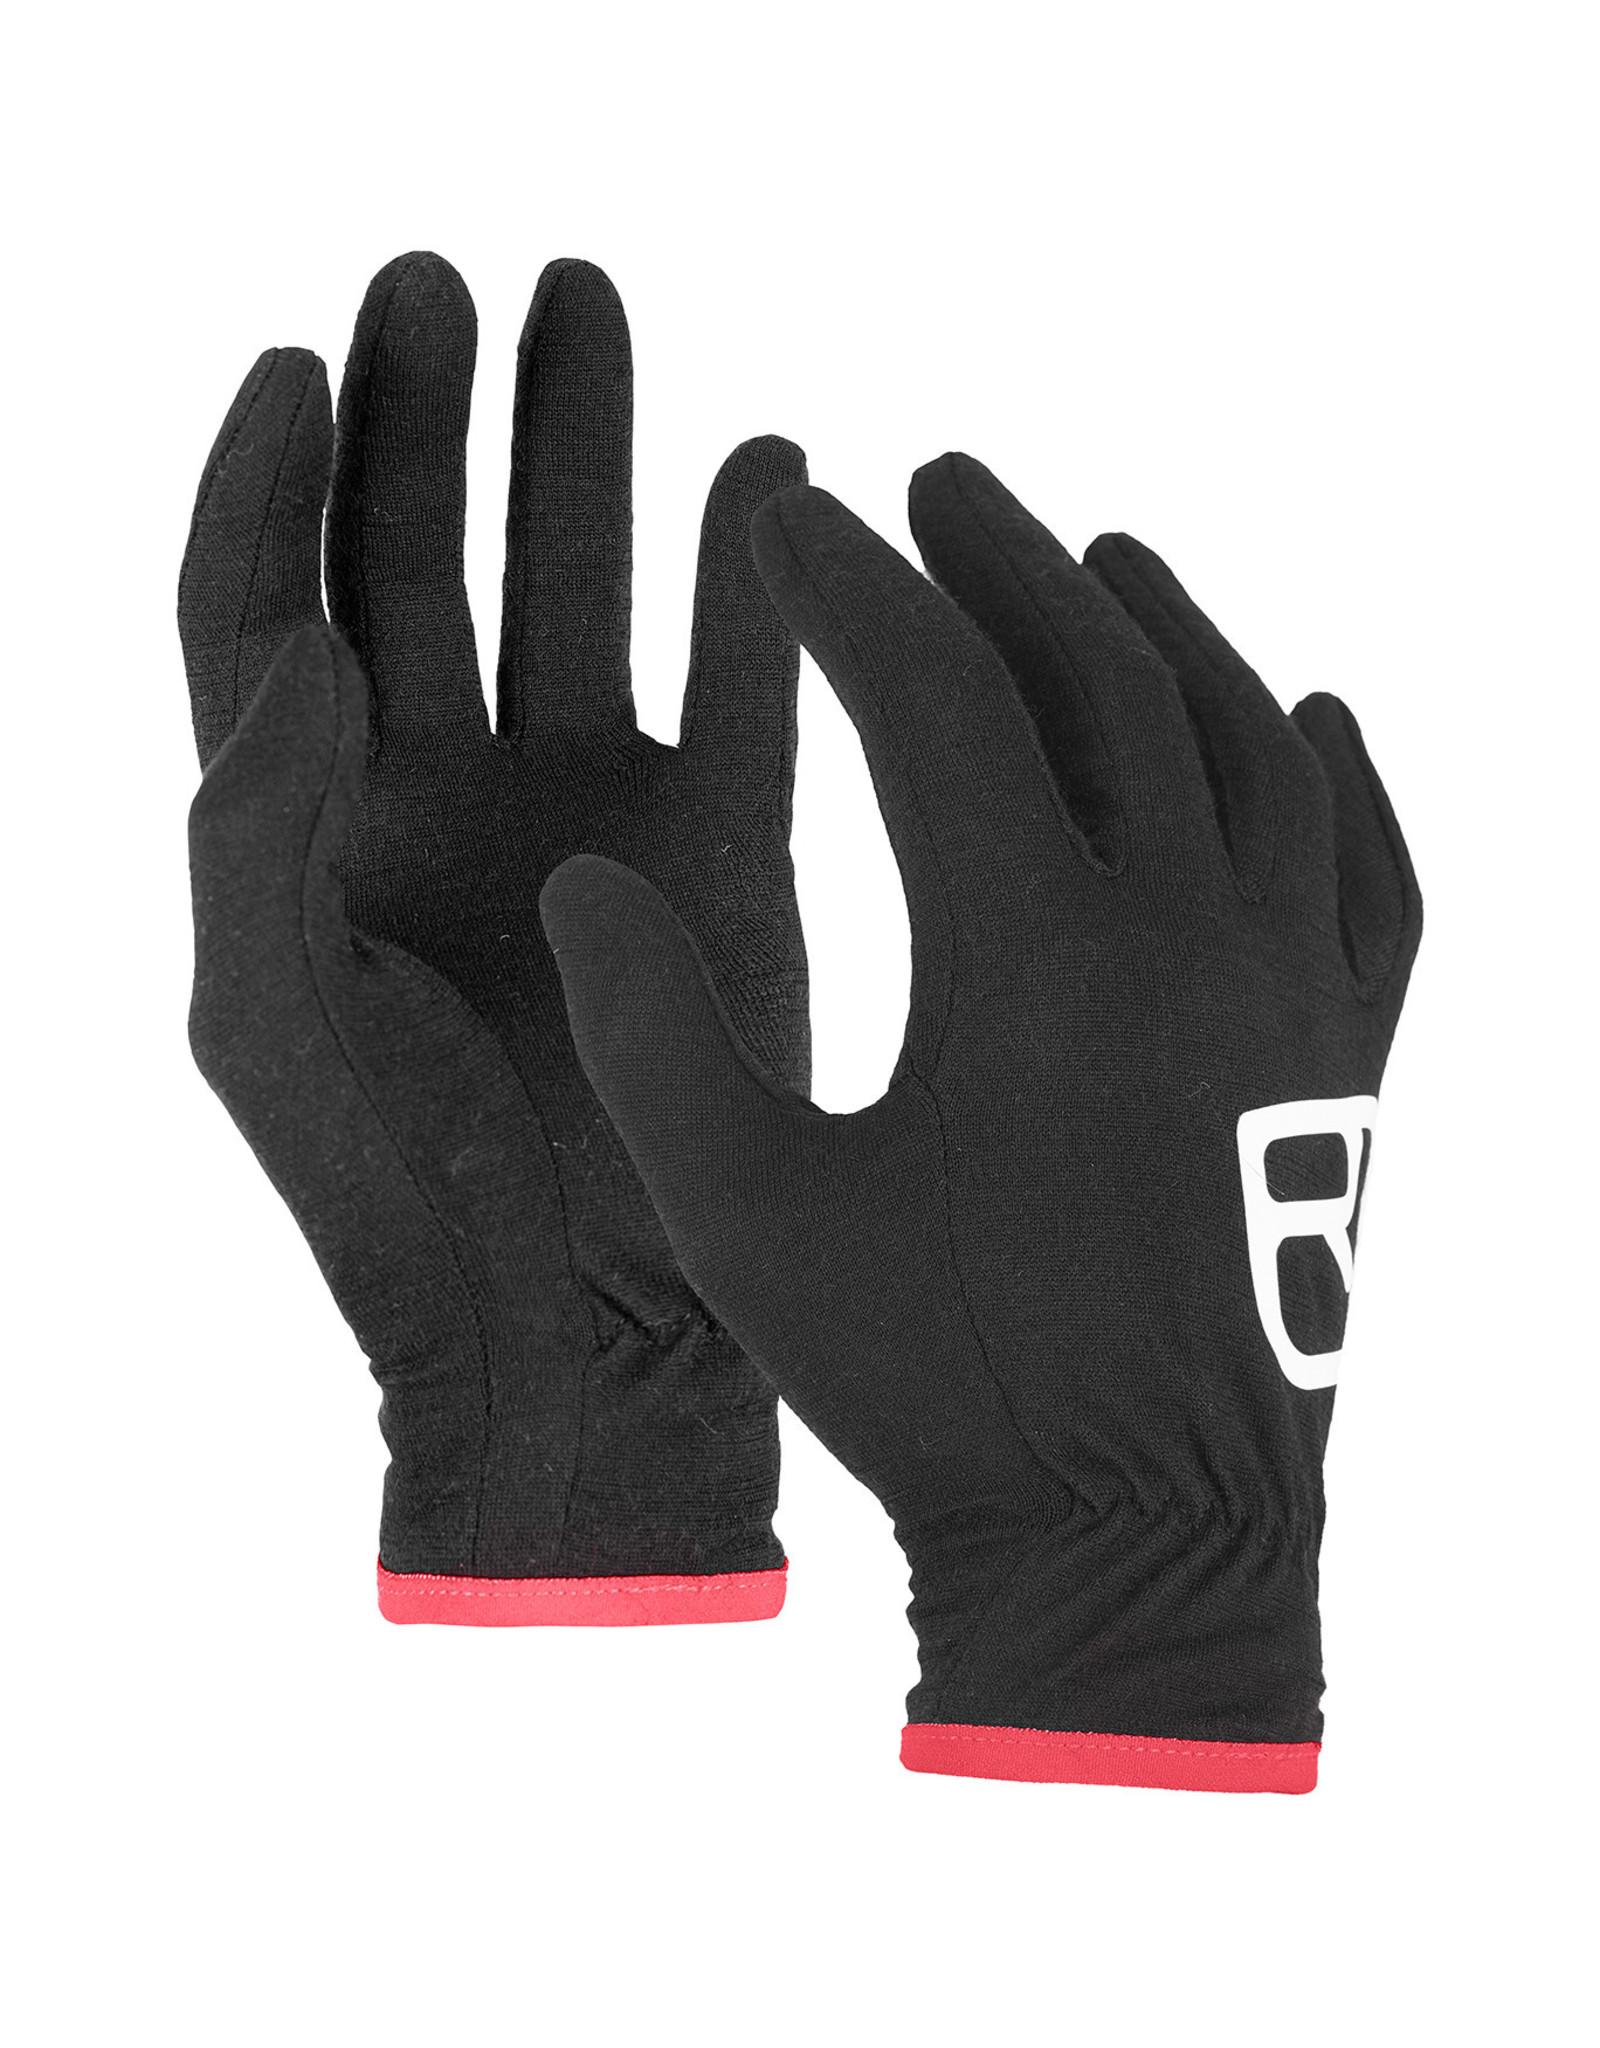 Ortovox Ortovox 145 Ultra Glove - Women